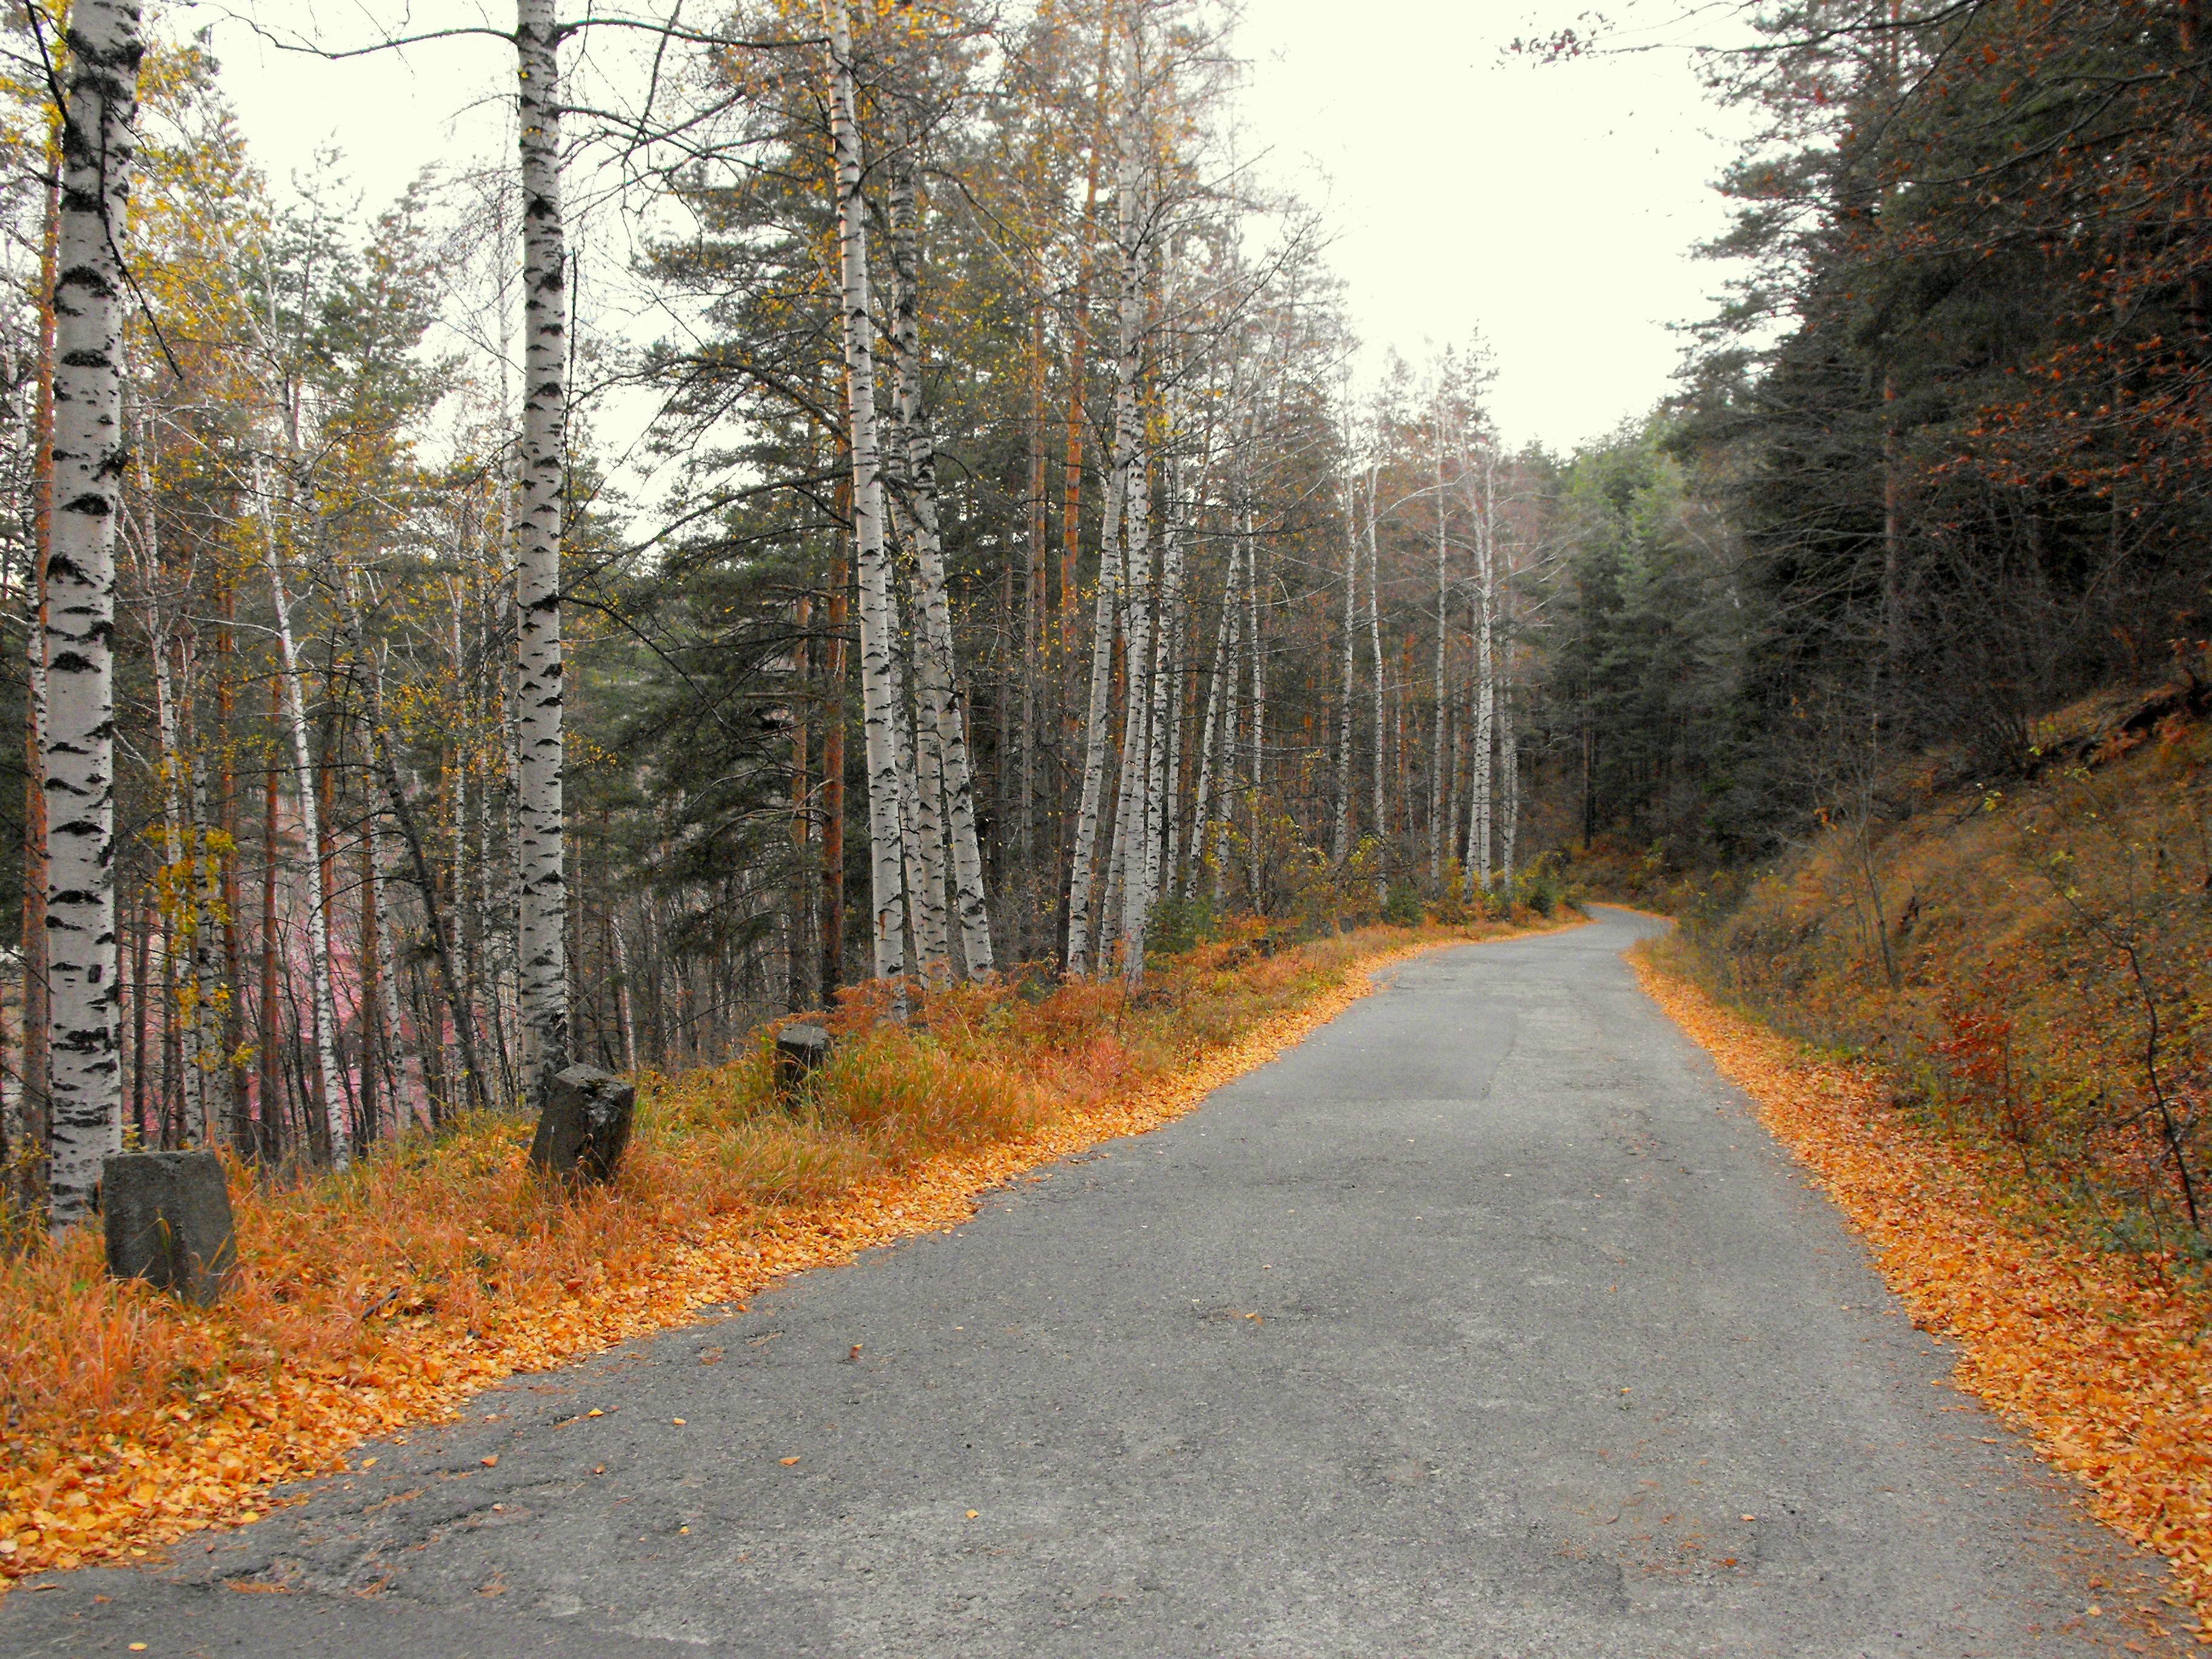 This road in Bulgaria has flame borders